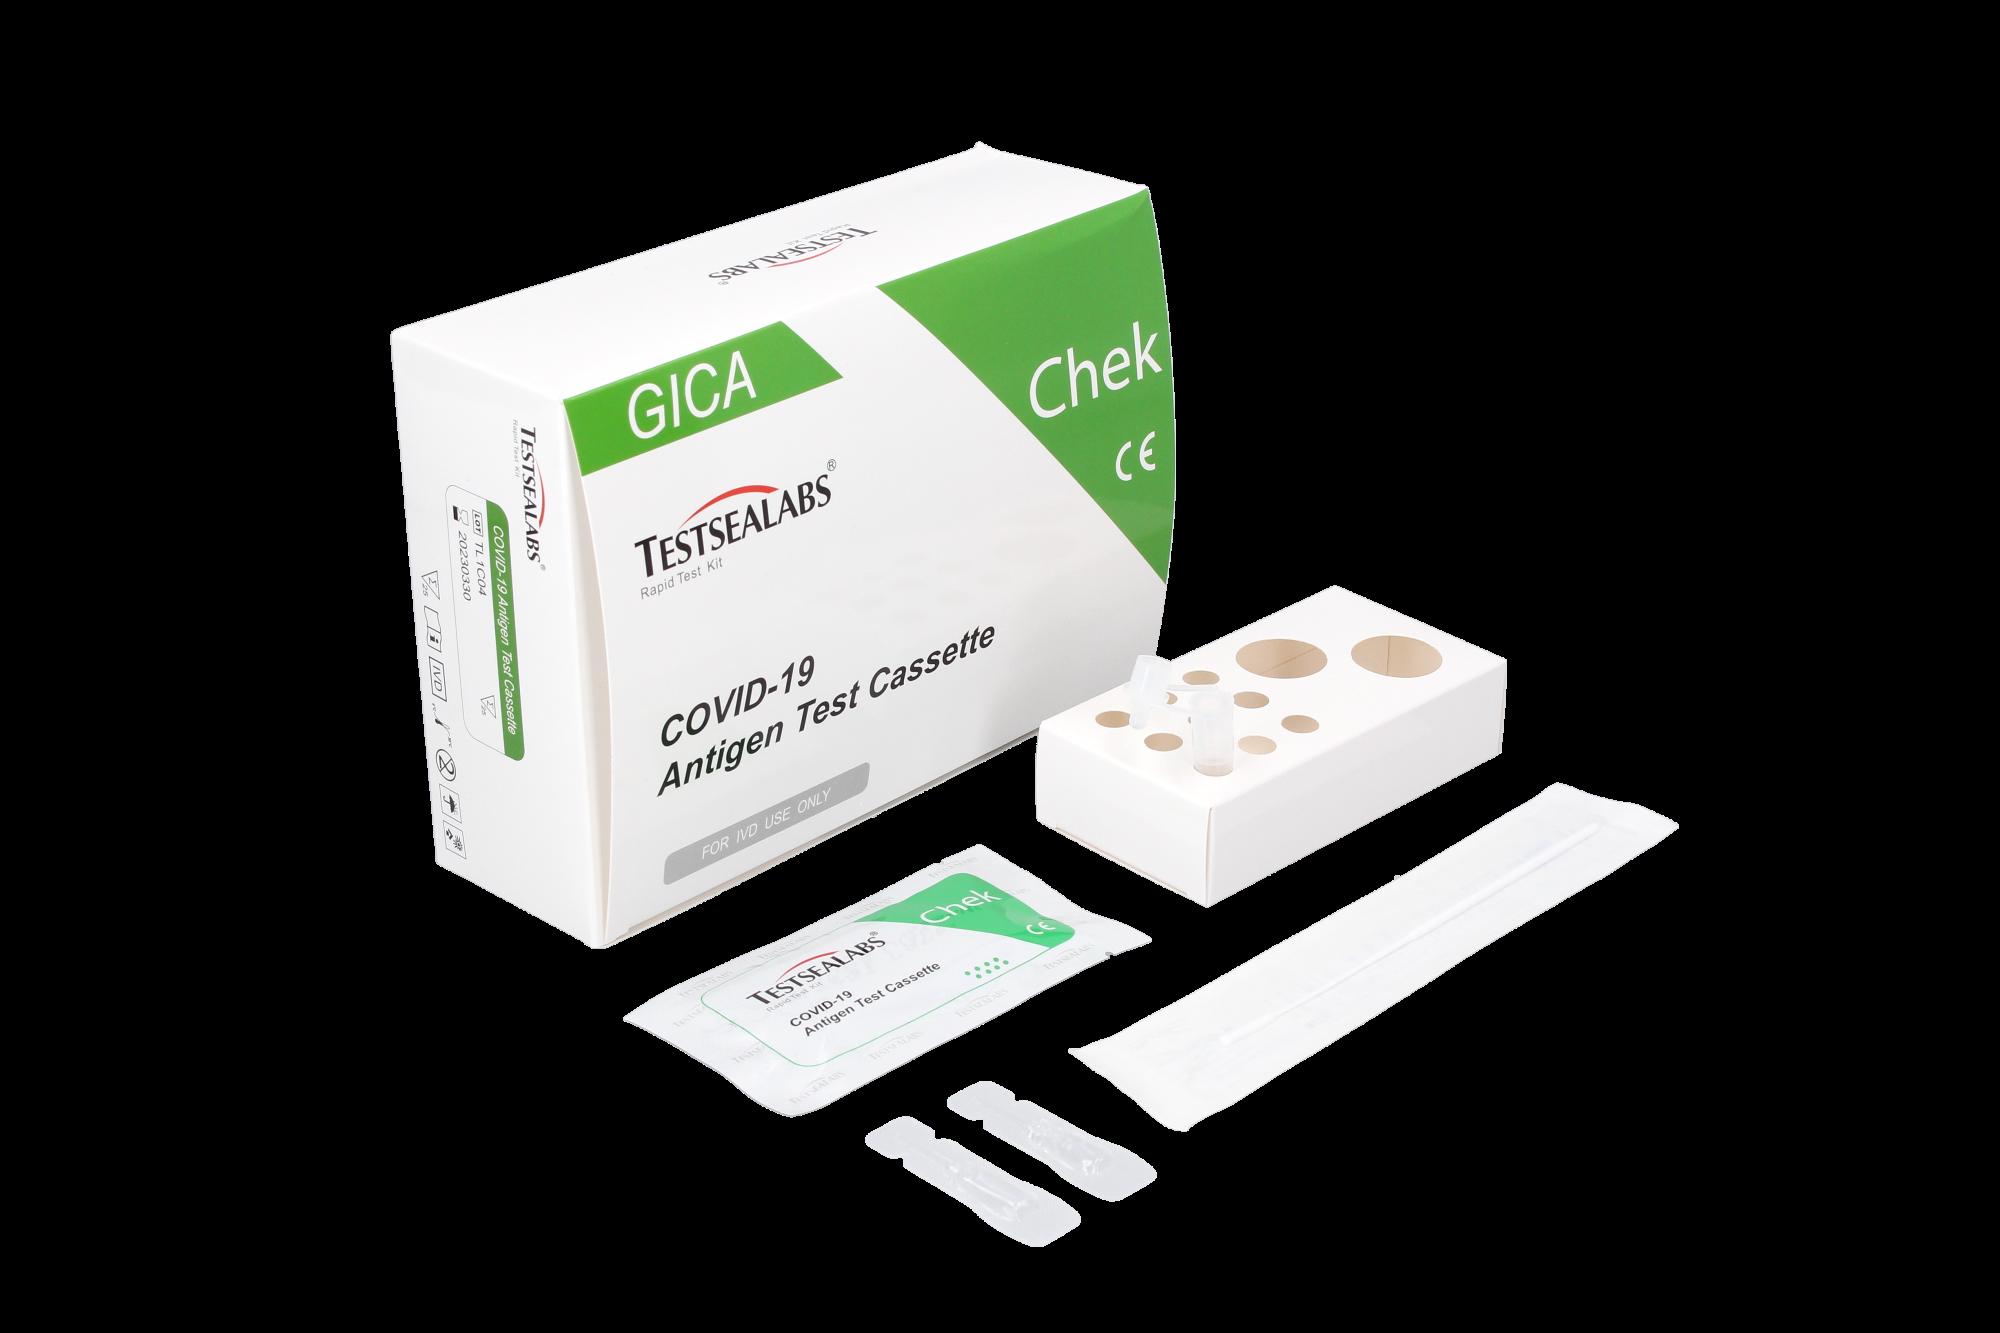 Kit 25 tests antigéniques Realy Tech